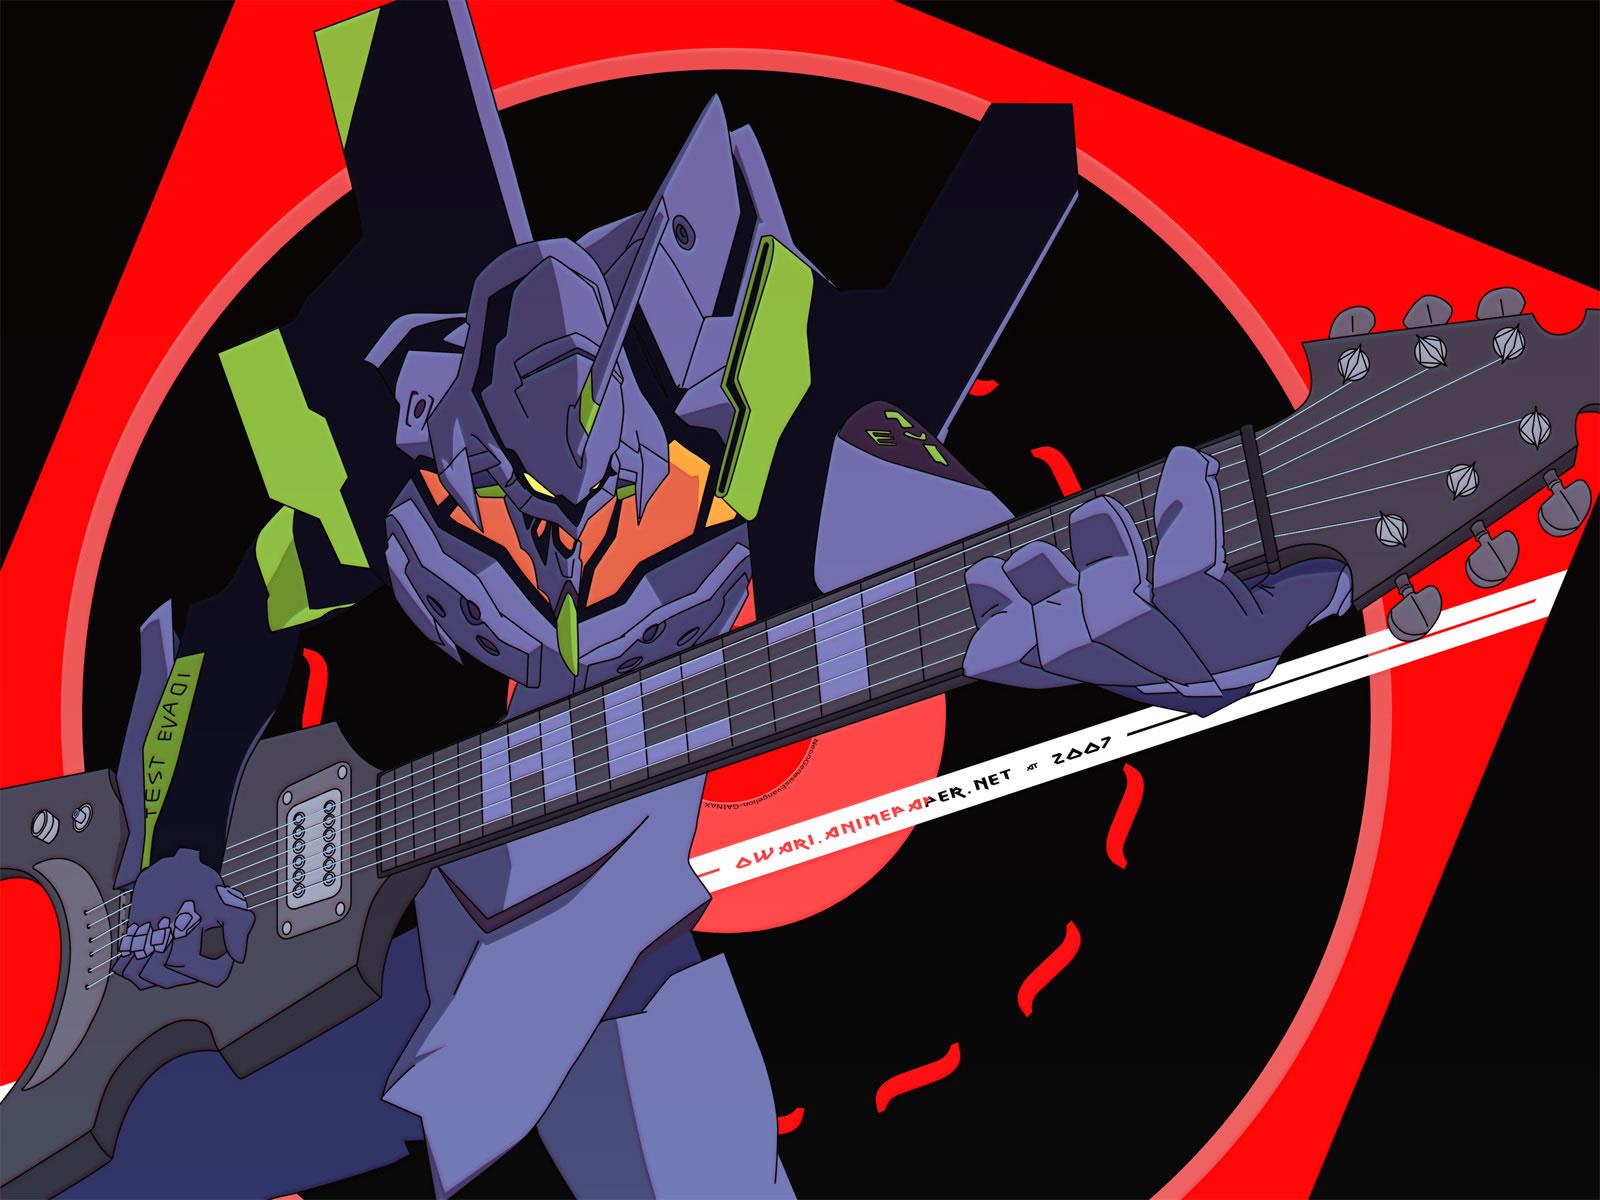 Eva Unit 01 Playing Guitar